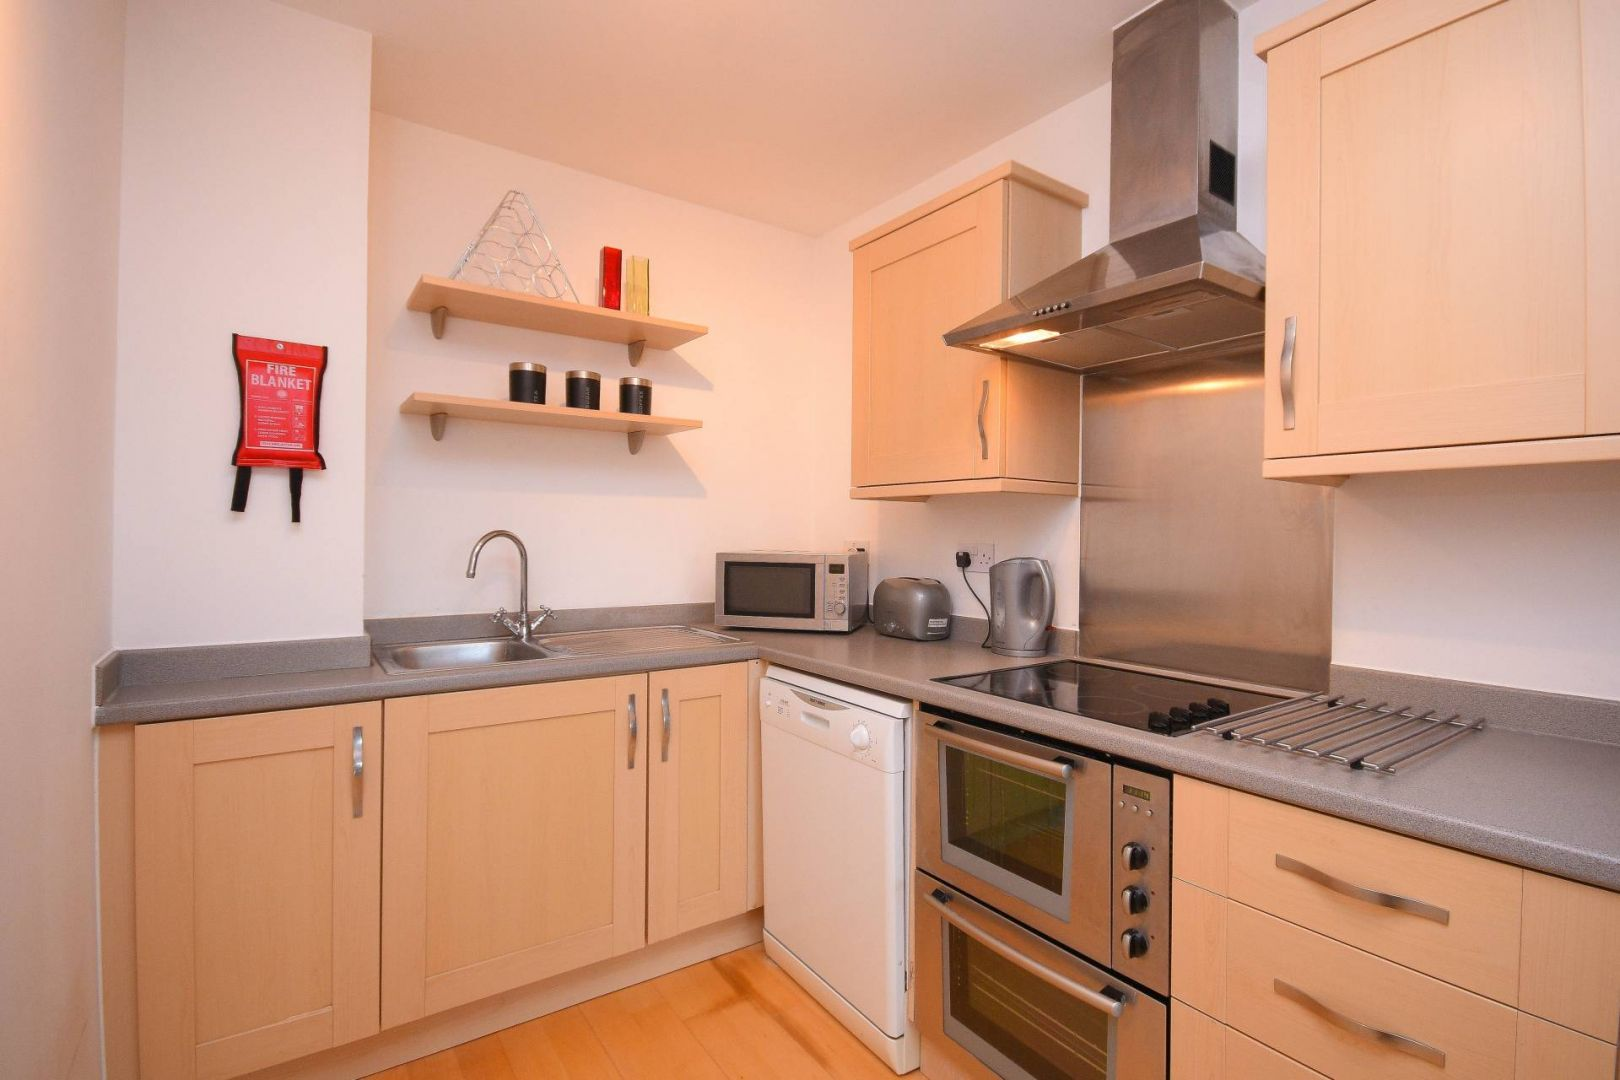 Sirocco Apartments, Southampton SO14 3JE